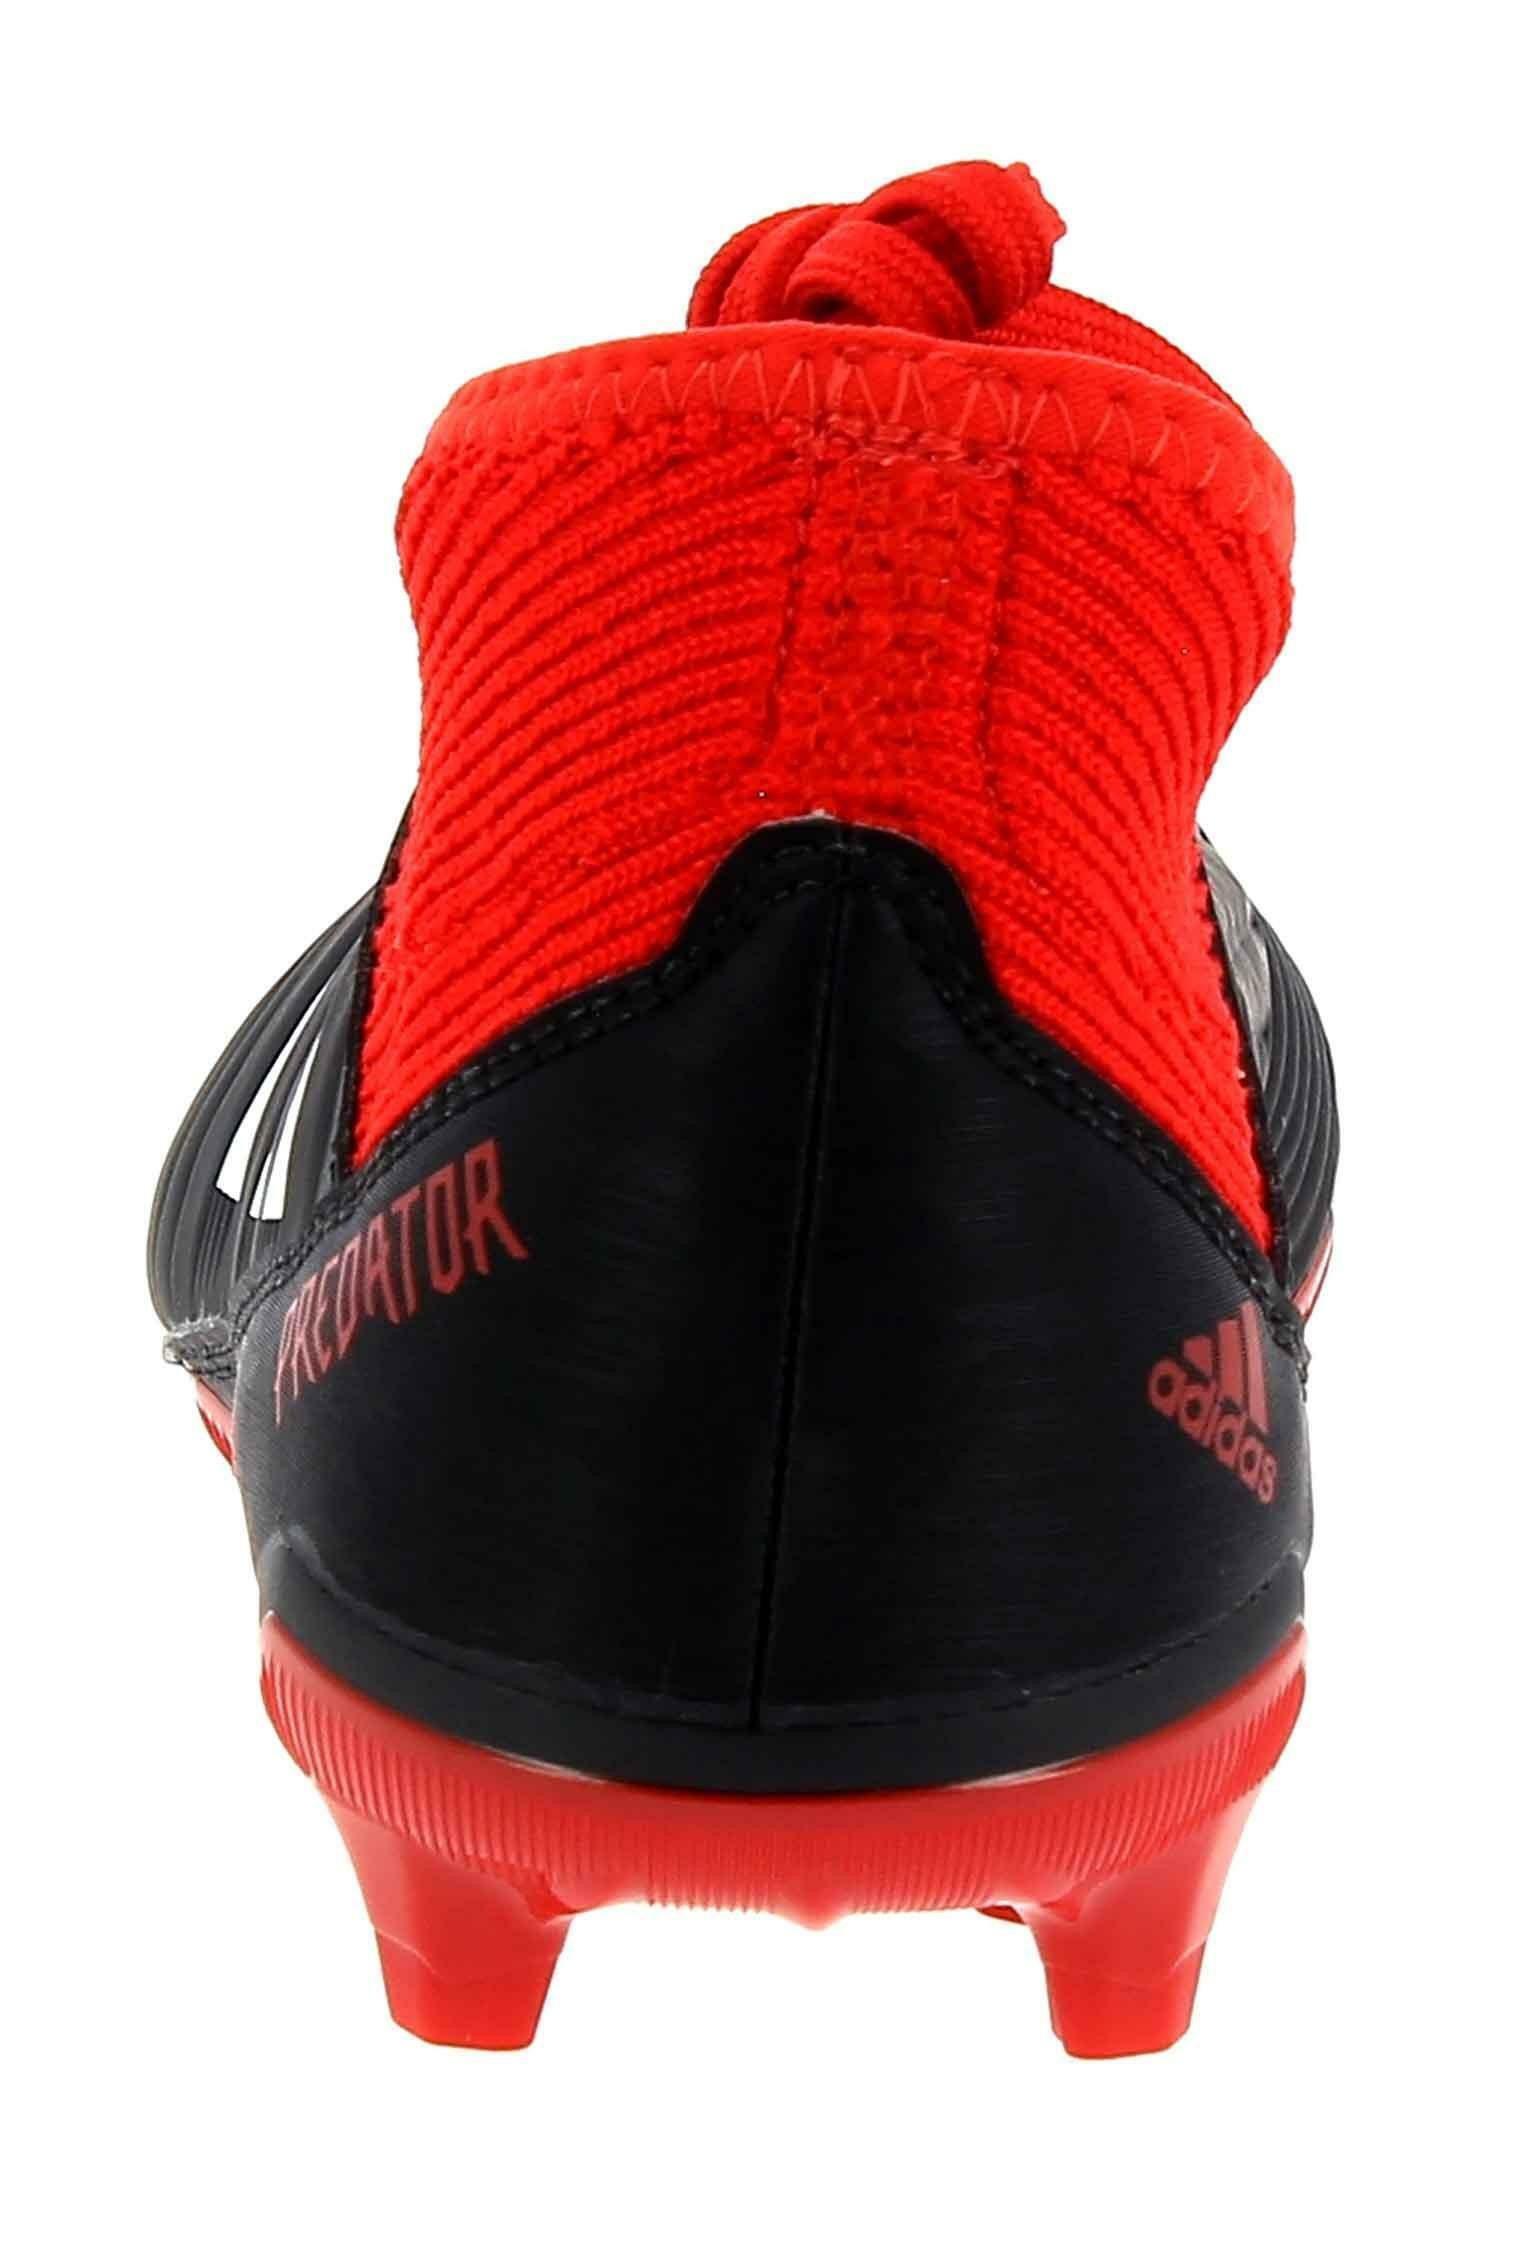 adidas adidas predator 18.3 fg scarpini calcio bambino db2318